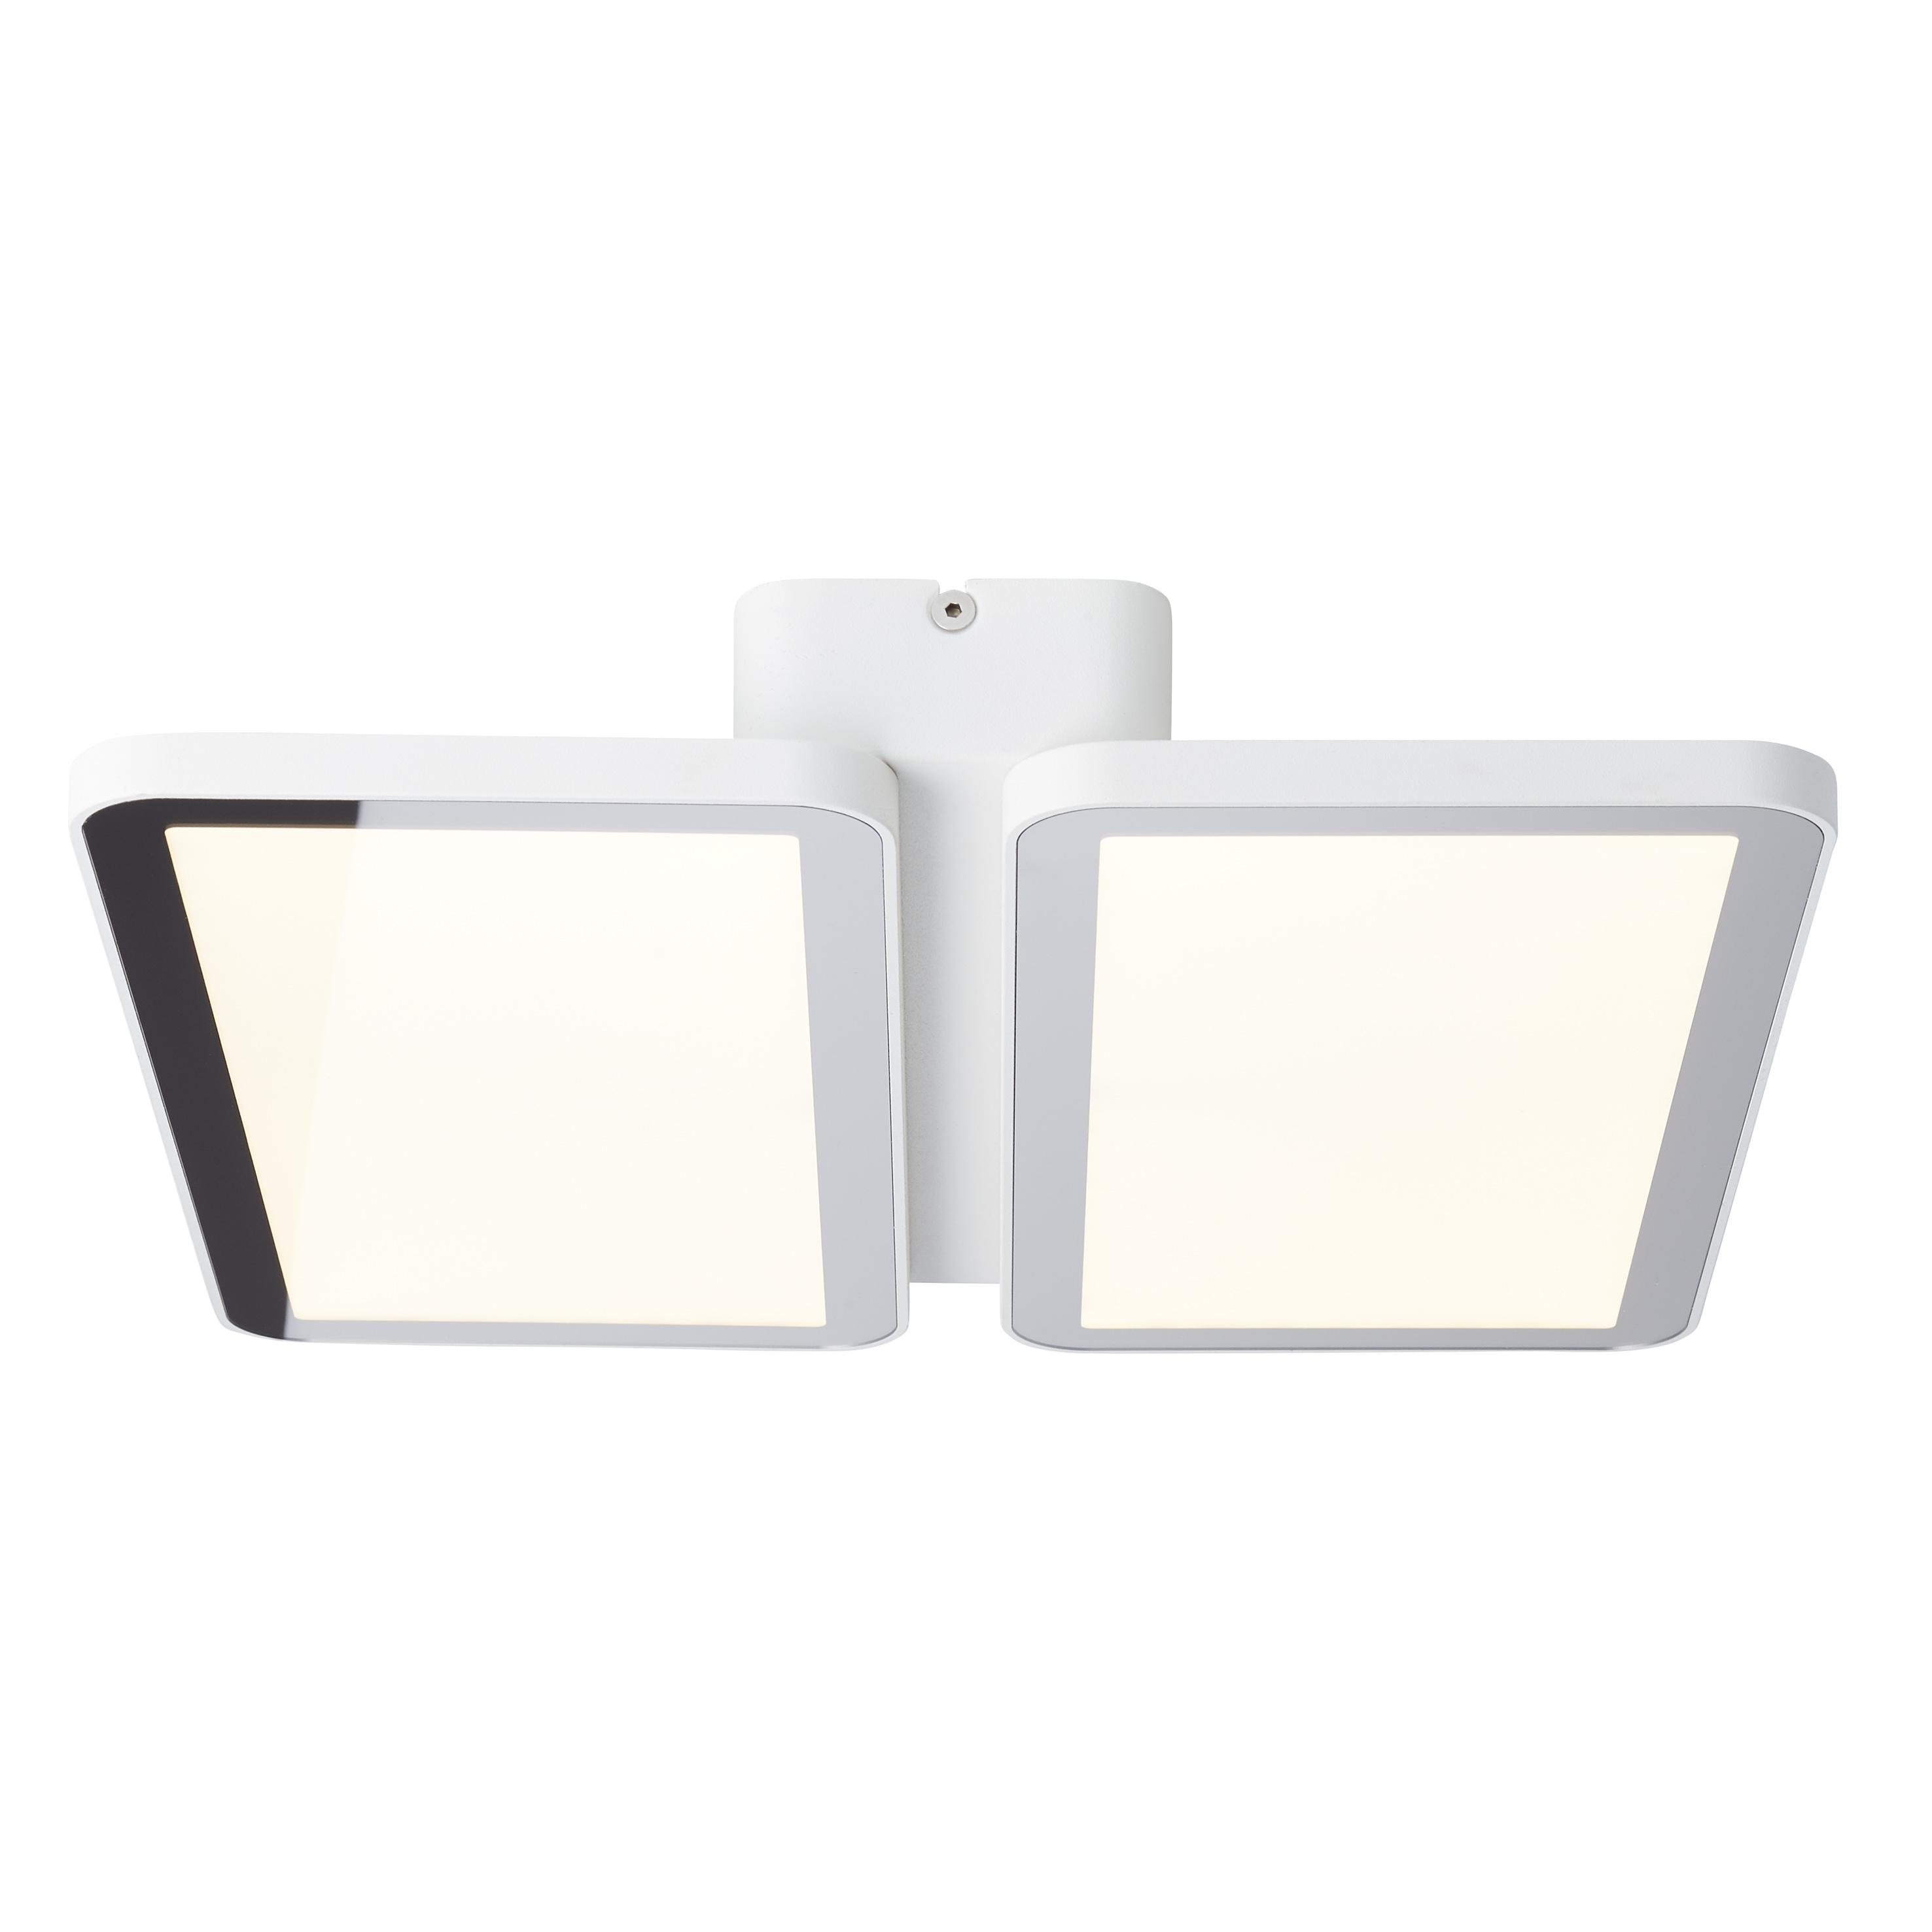 AEG Legra LED Deckenaufbau-Paneel 32x32cm sand weiß/chrom